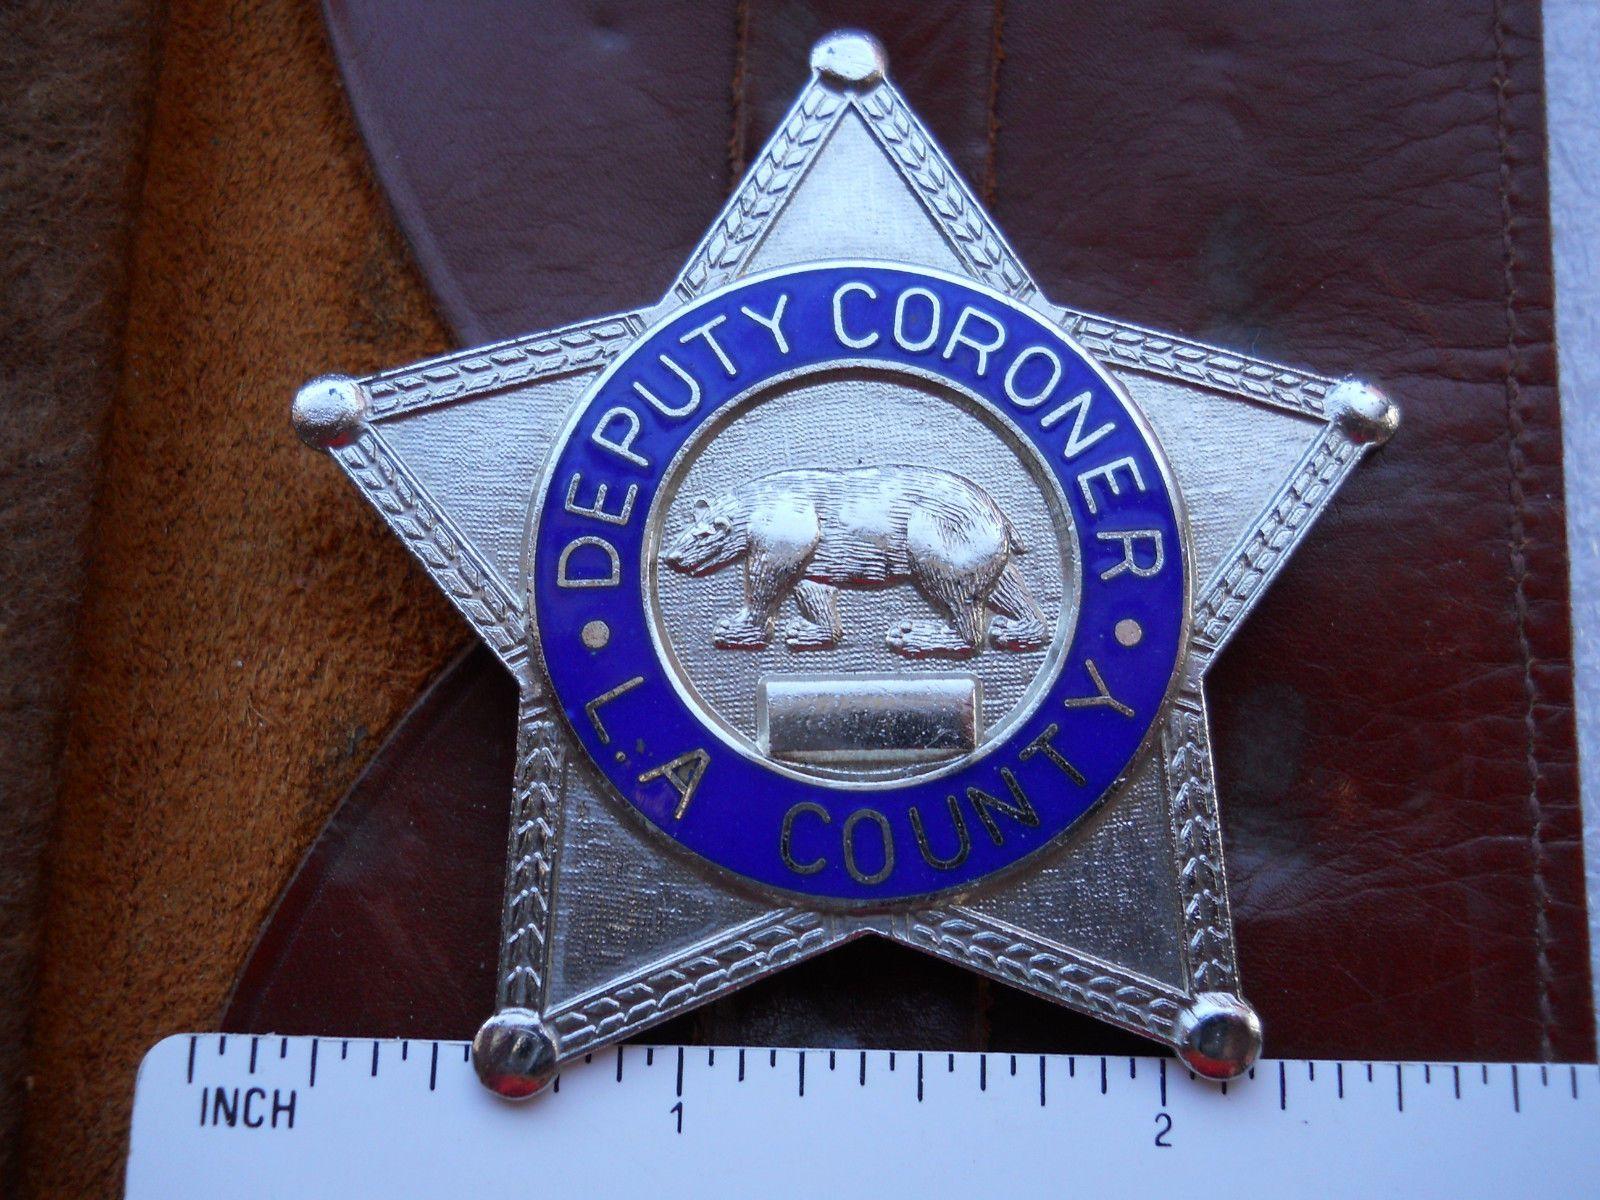 Deputy coroner los angeles county california police